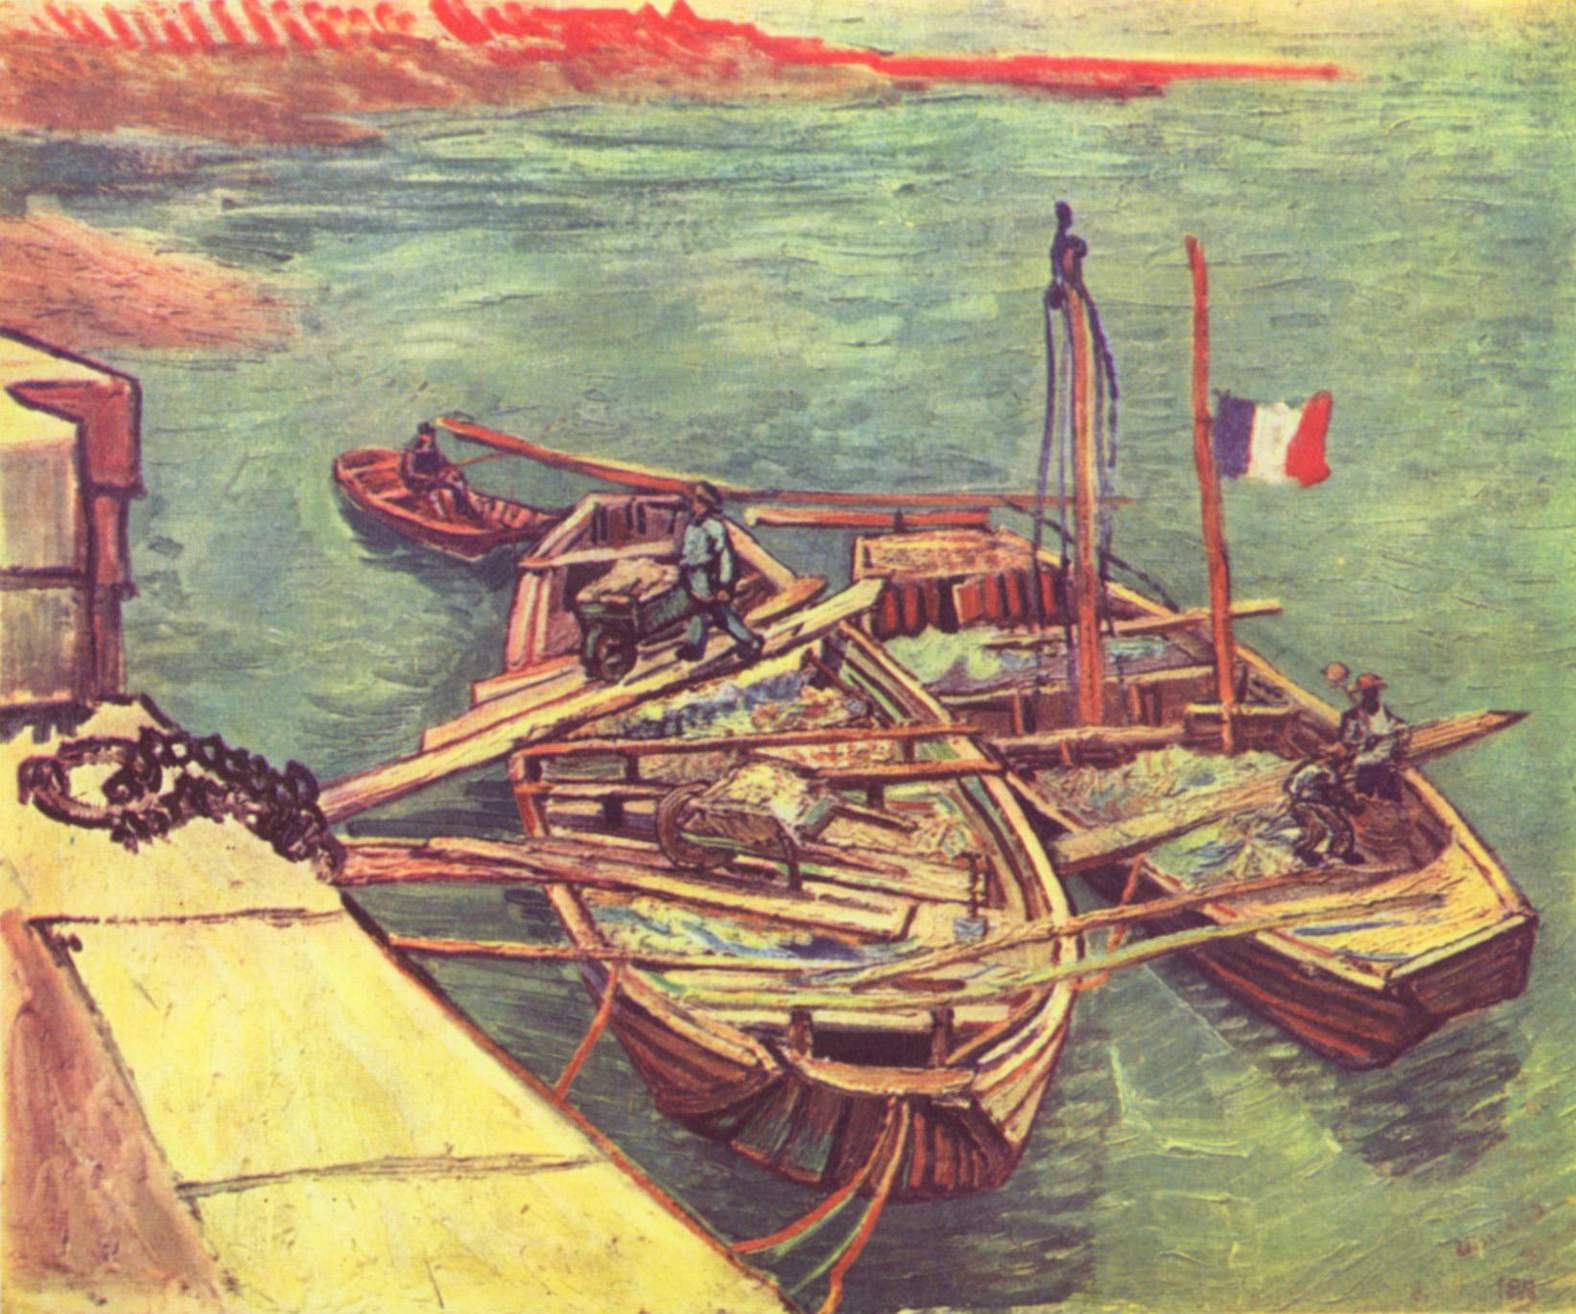 Vincent van Gogh - Vincents Schlafzimmer  Artelista.com